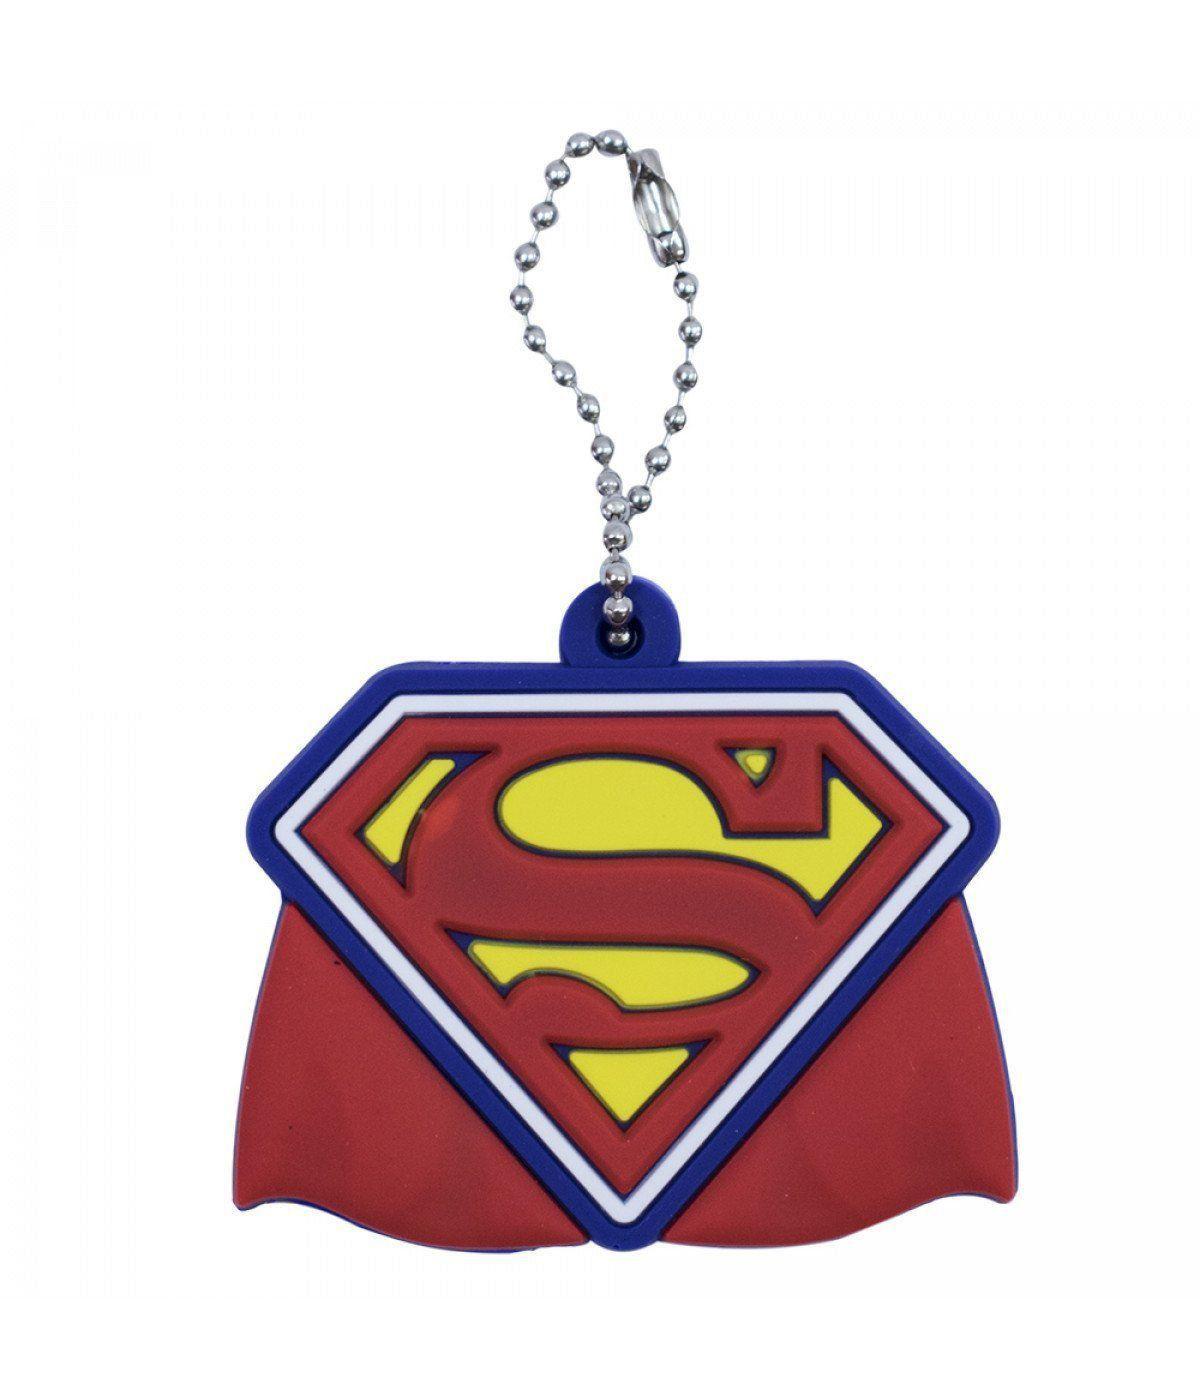 Capa para Chave Superman (Super-hoem) - DC